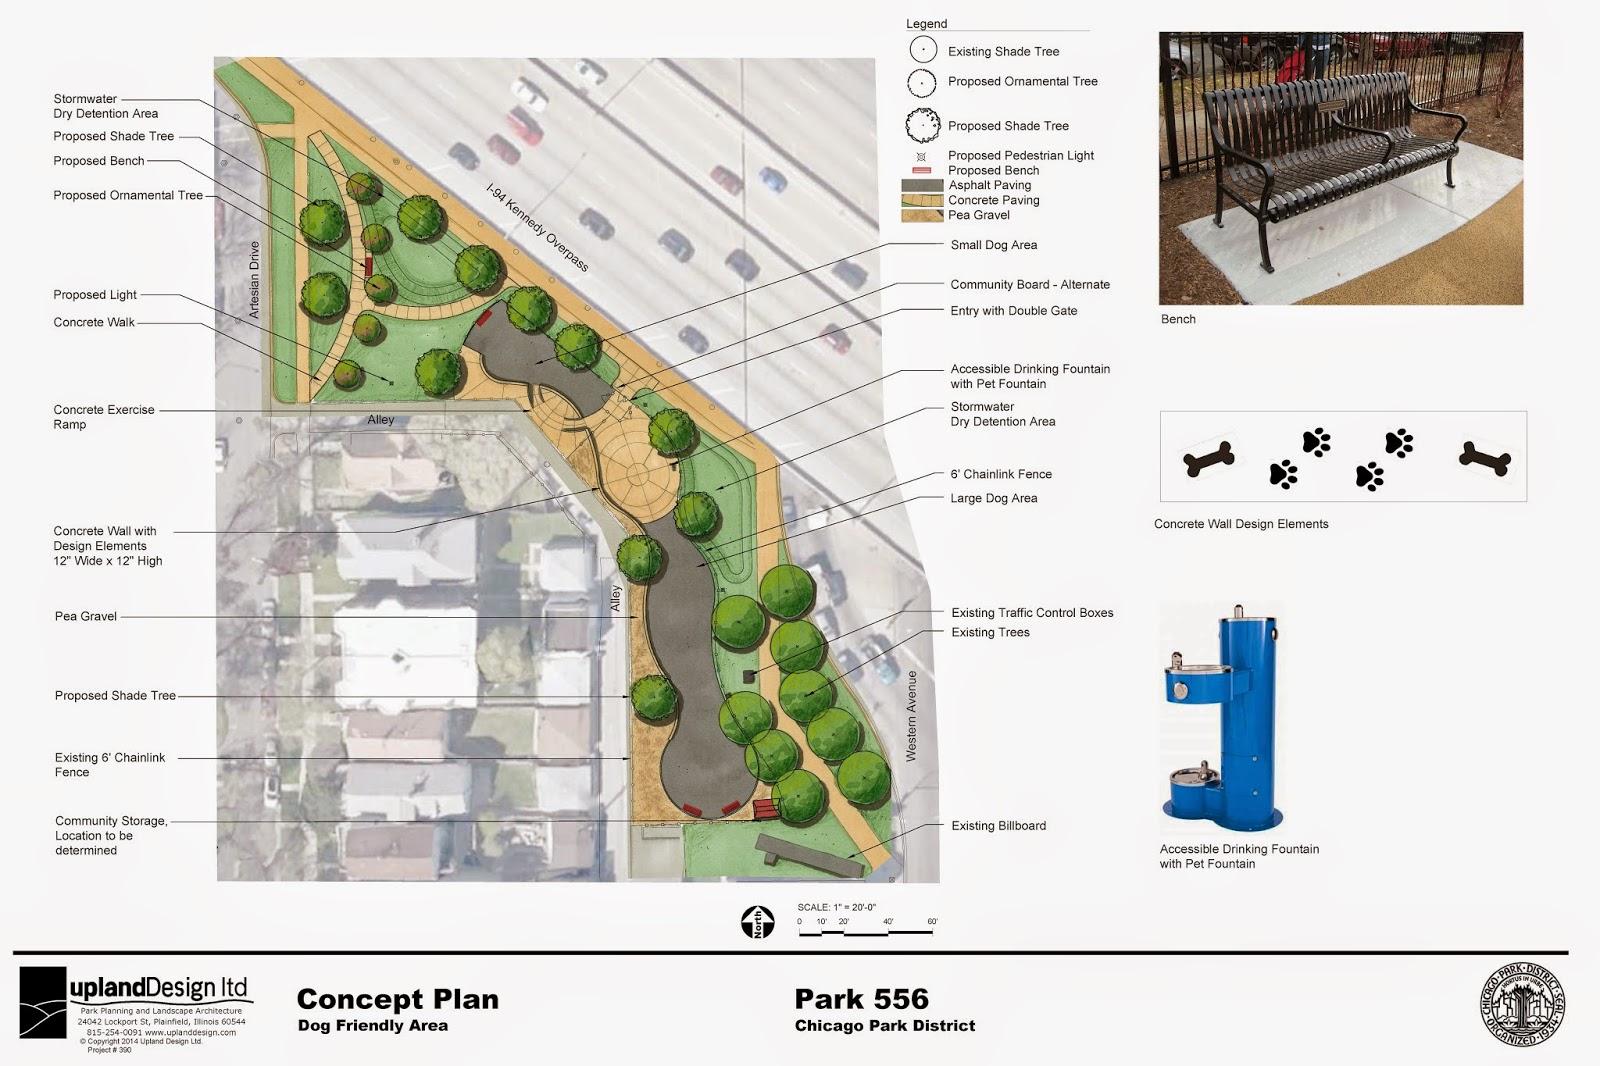 Logan Square Dog Park Architectural Plans For The Dog Park - Map of chicago dog parks